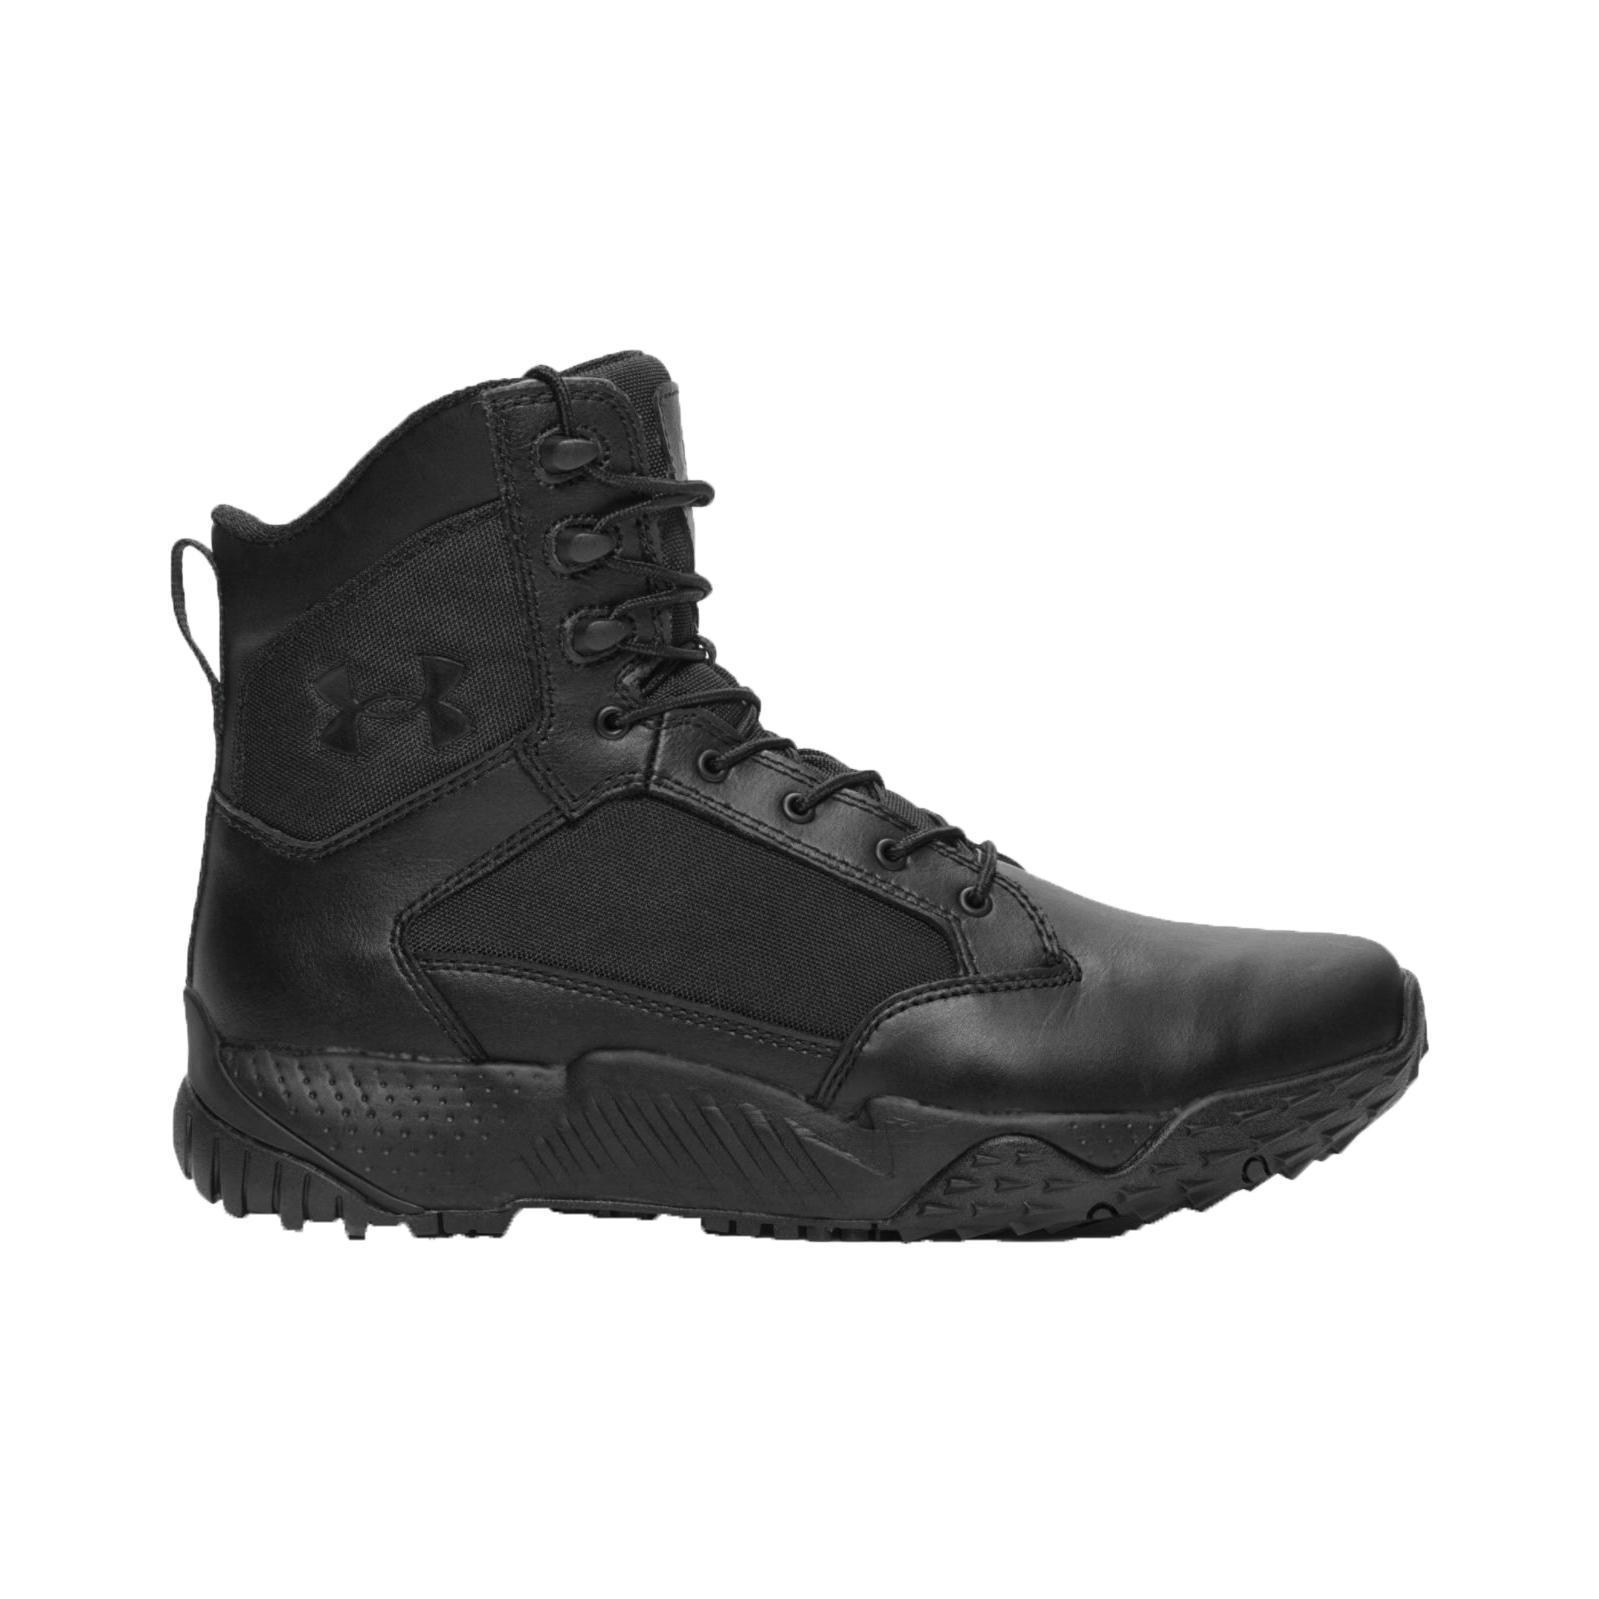 Under Armour Men's Stellar 8″ Tactical Boot